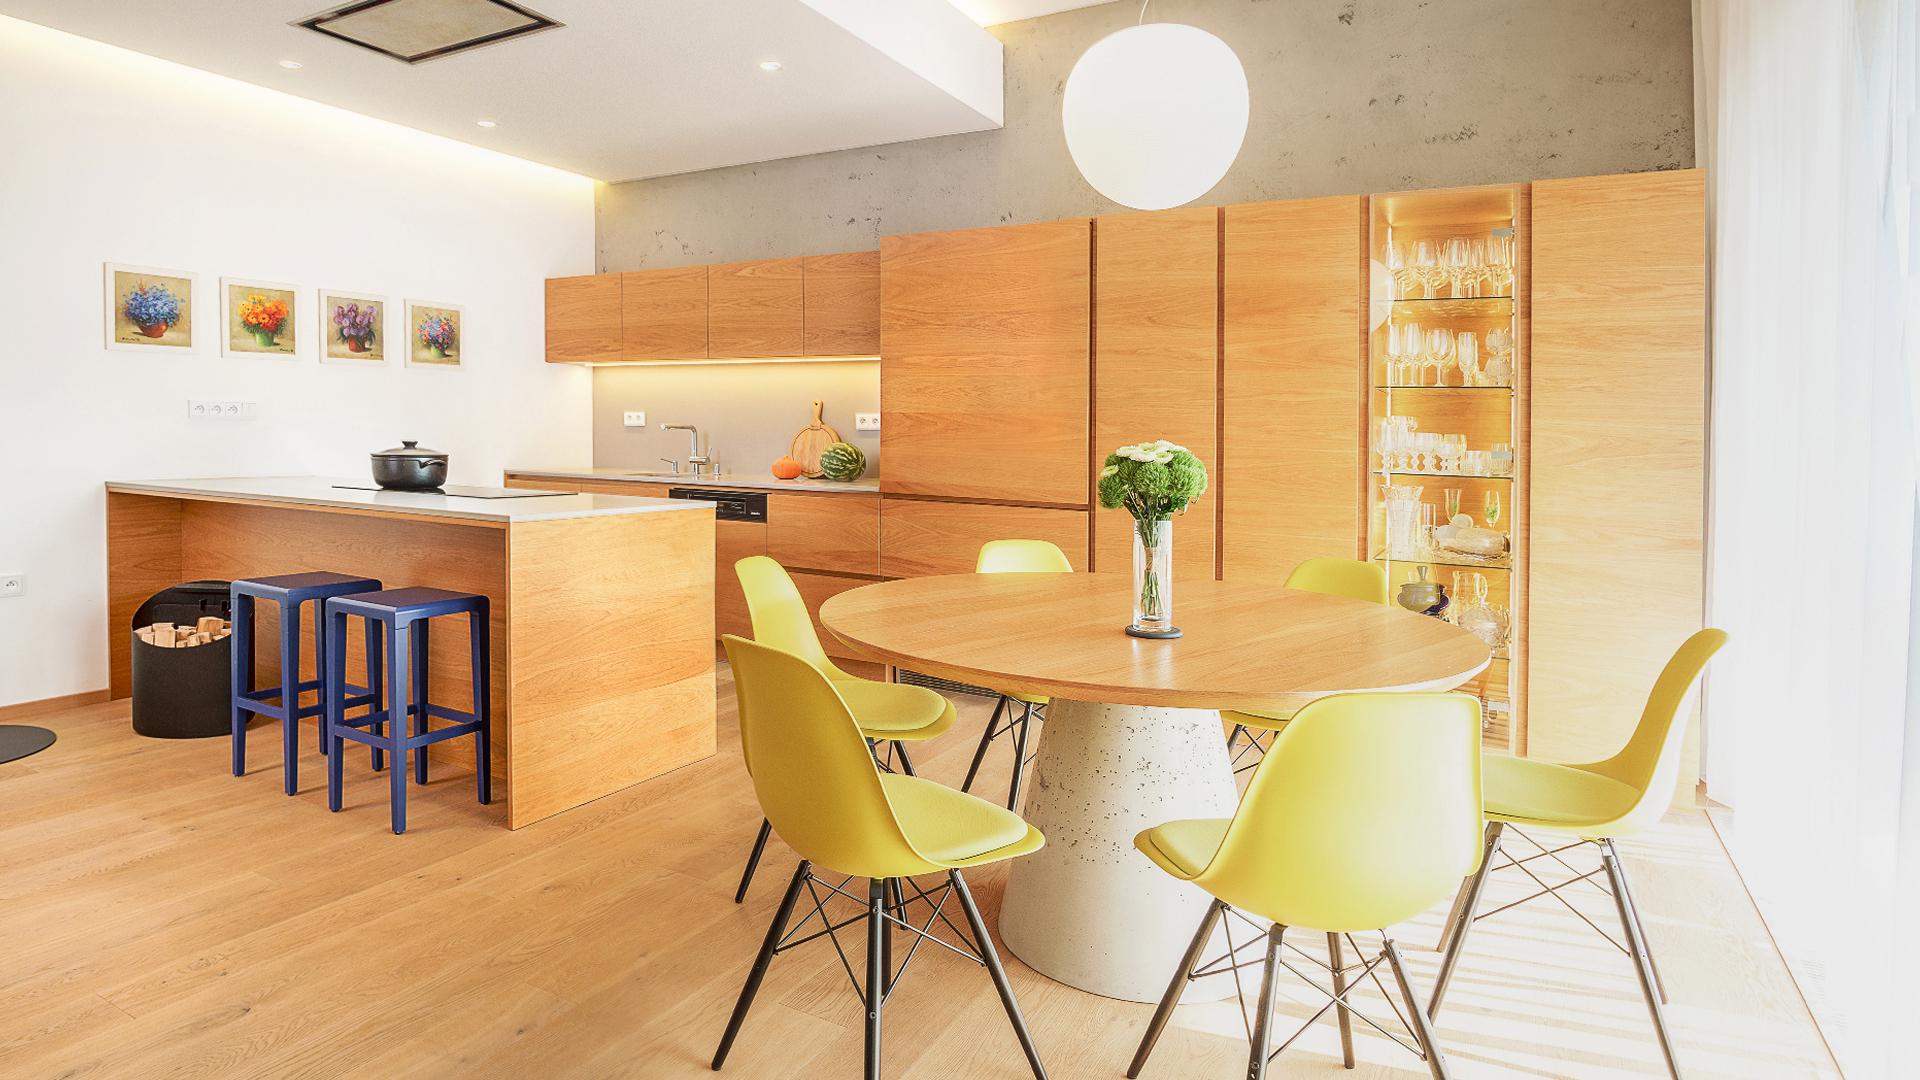 navrh interiru domu, zelene terasy, devin, interier domu, navrh jedalne, navrh kuchyne, navrh interieru kuchyne, navrh interieru, dizajn interieru, interierovy dizajner, interierovy dizajn, foscarini, dining room, kitchen design, interior design, vitra chair, interior designer , prirodny dub, ton, dubova dyha,